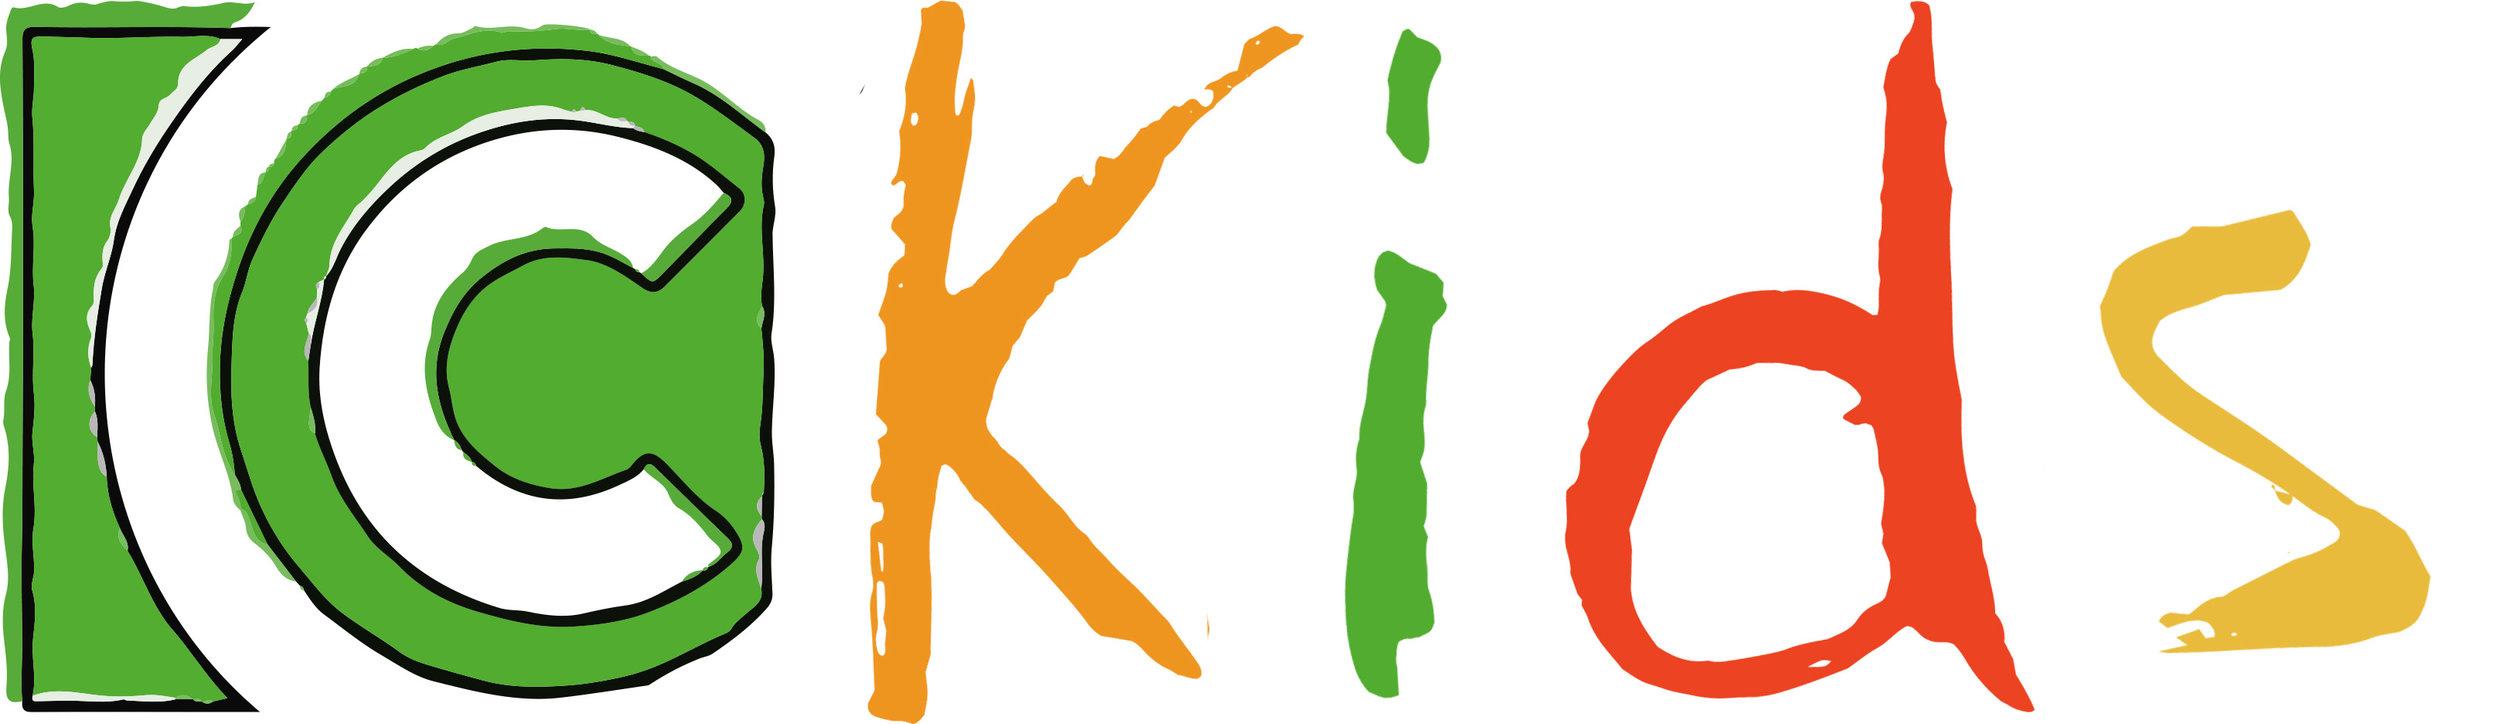 CC Kids logo.jpg